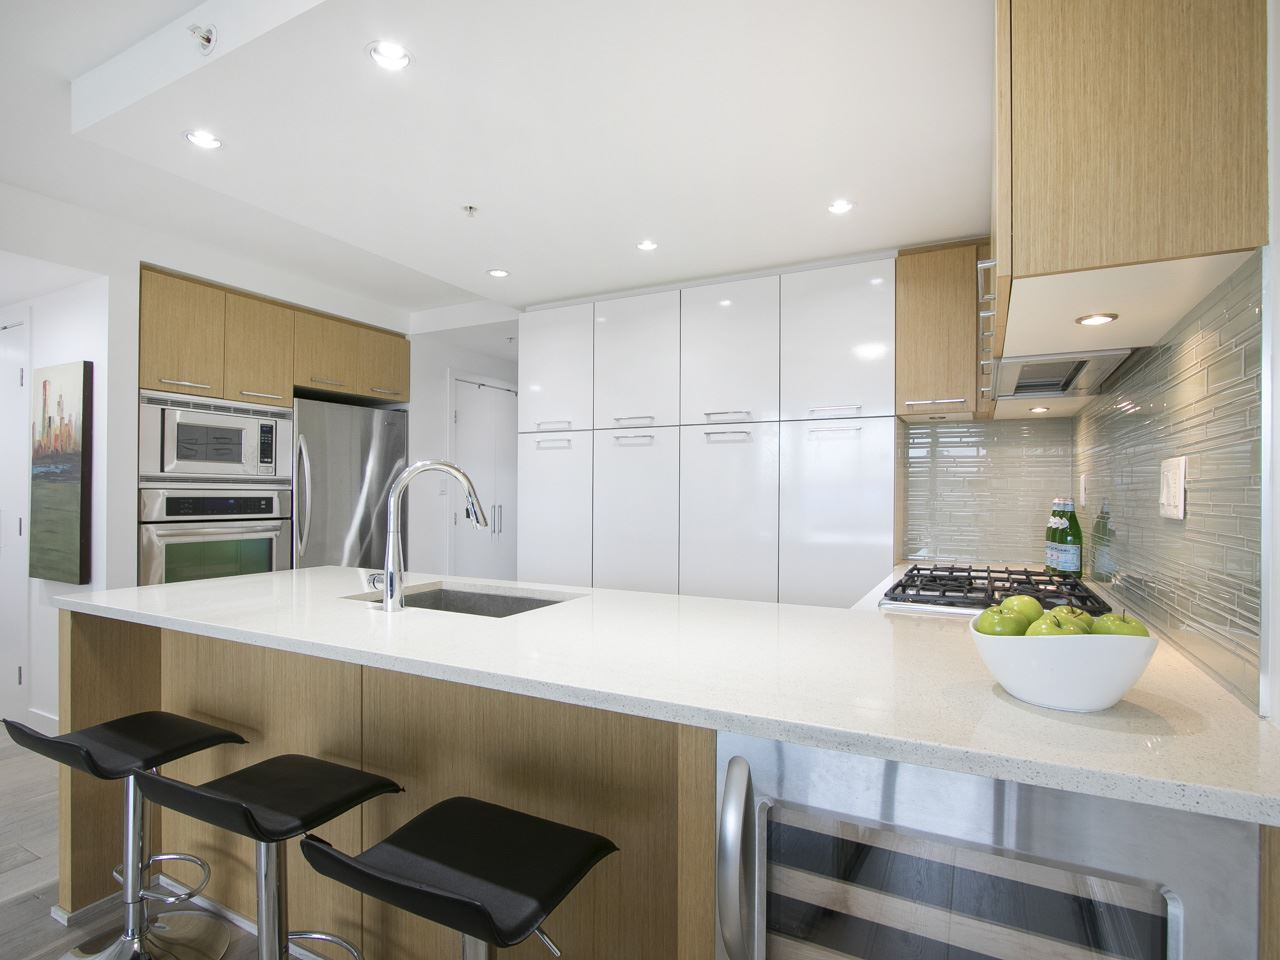 Condo Apartment at 310 1680 W 4TH AVENUE, Unit 310, Vancouver West, British Columbia. Image 10